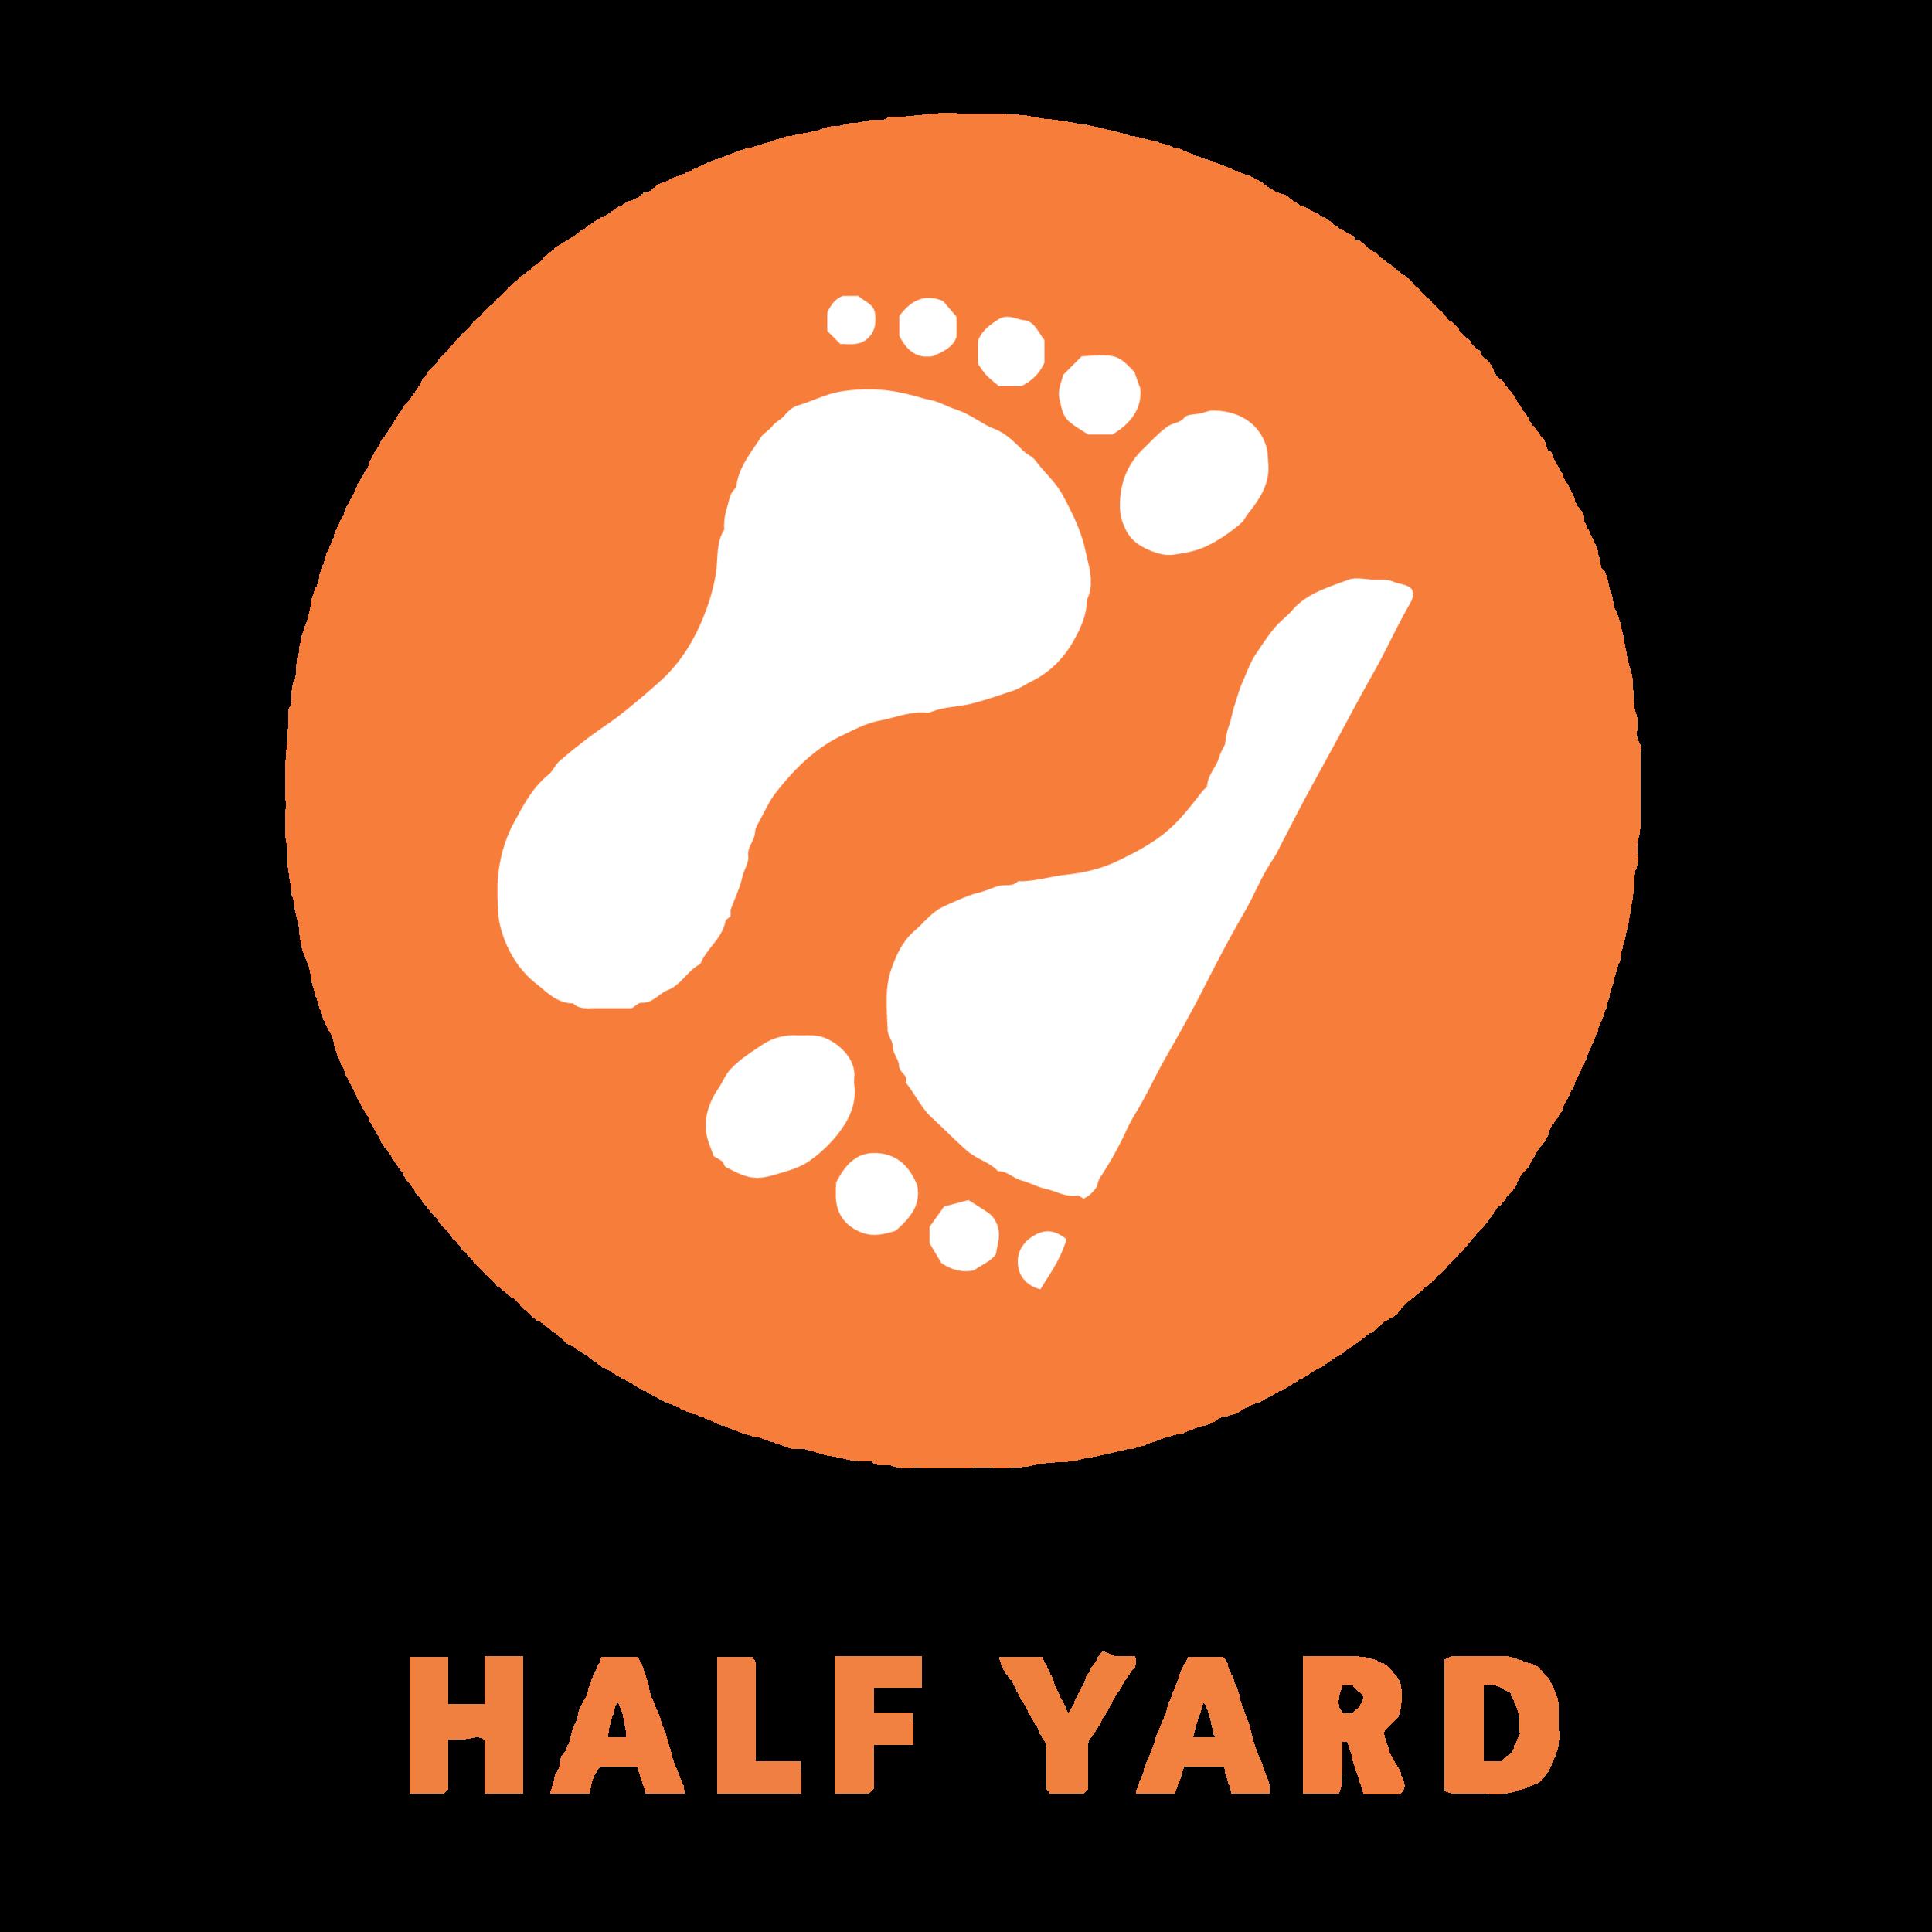 Half Yard (Adjusted).png